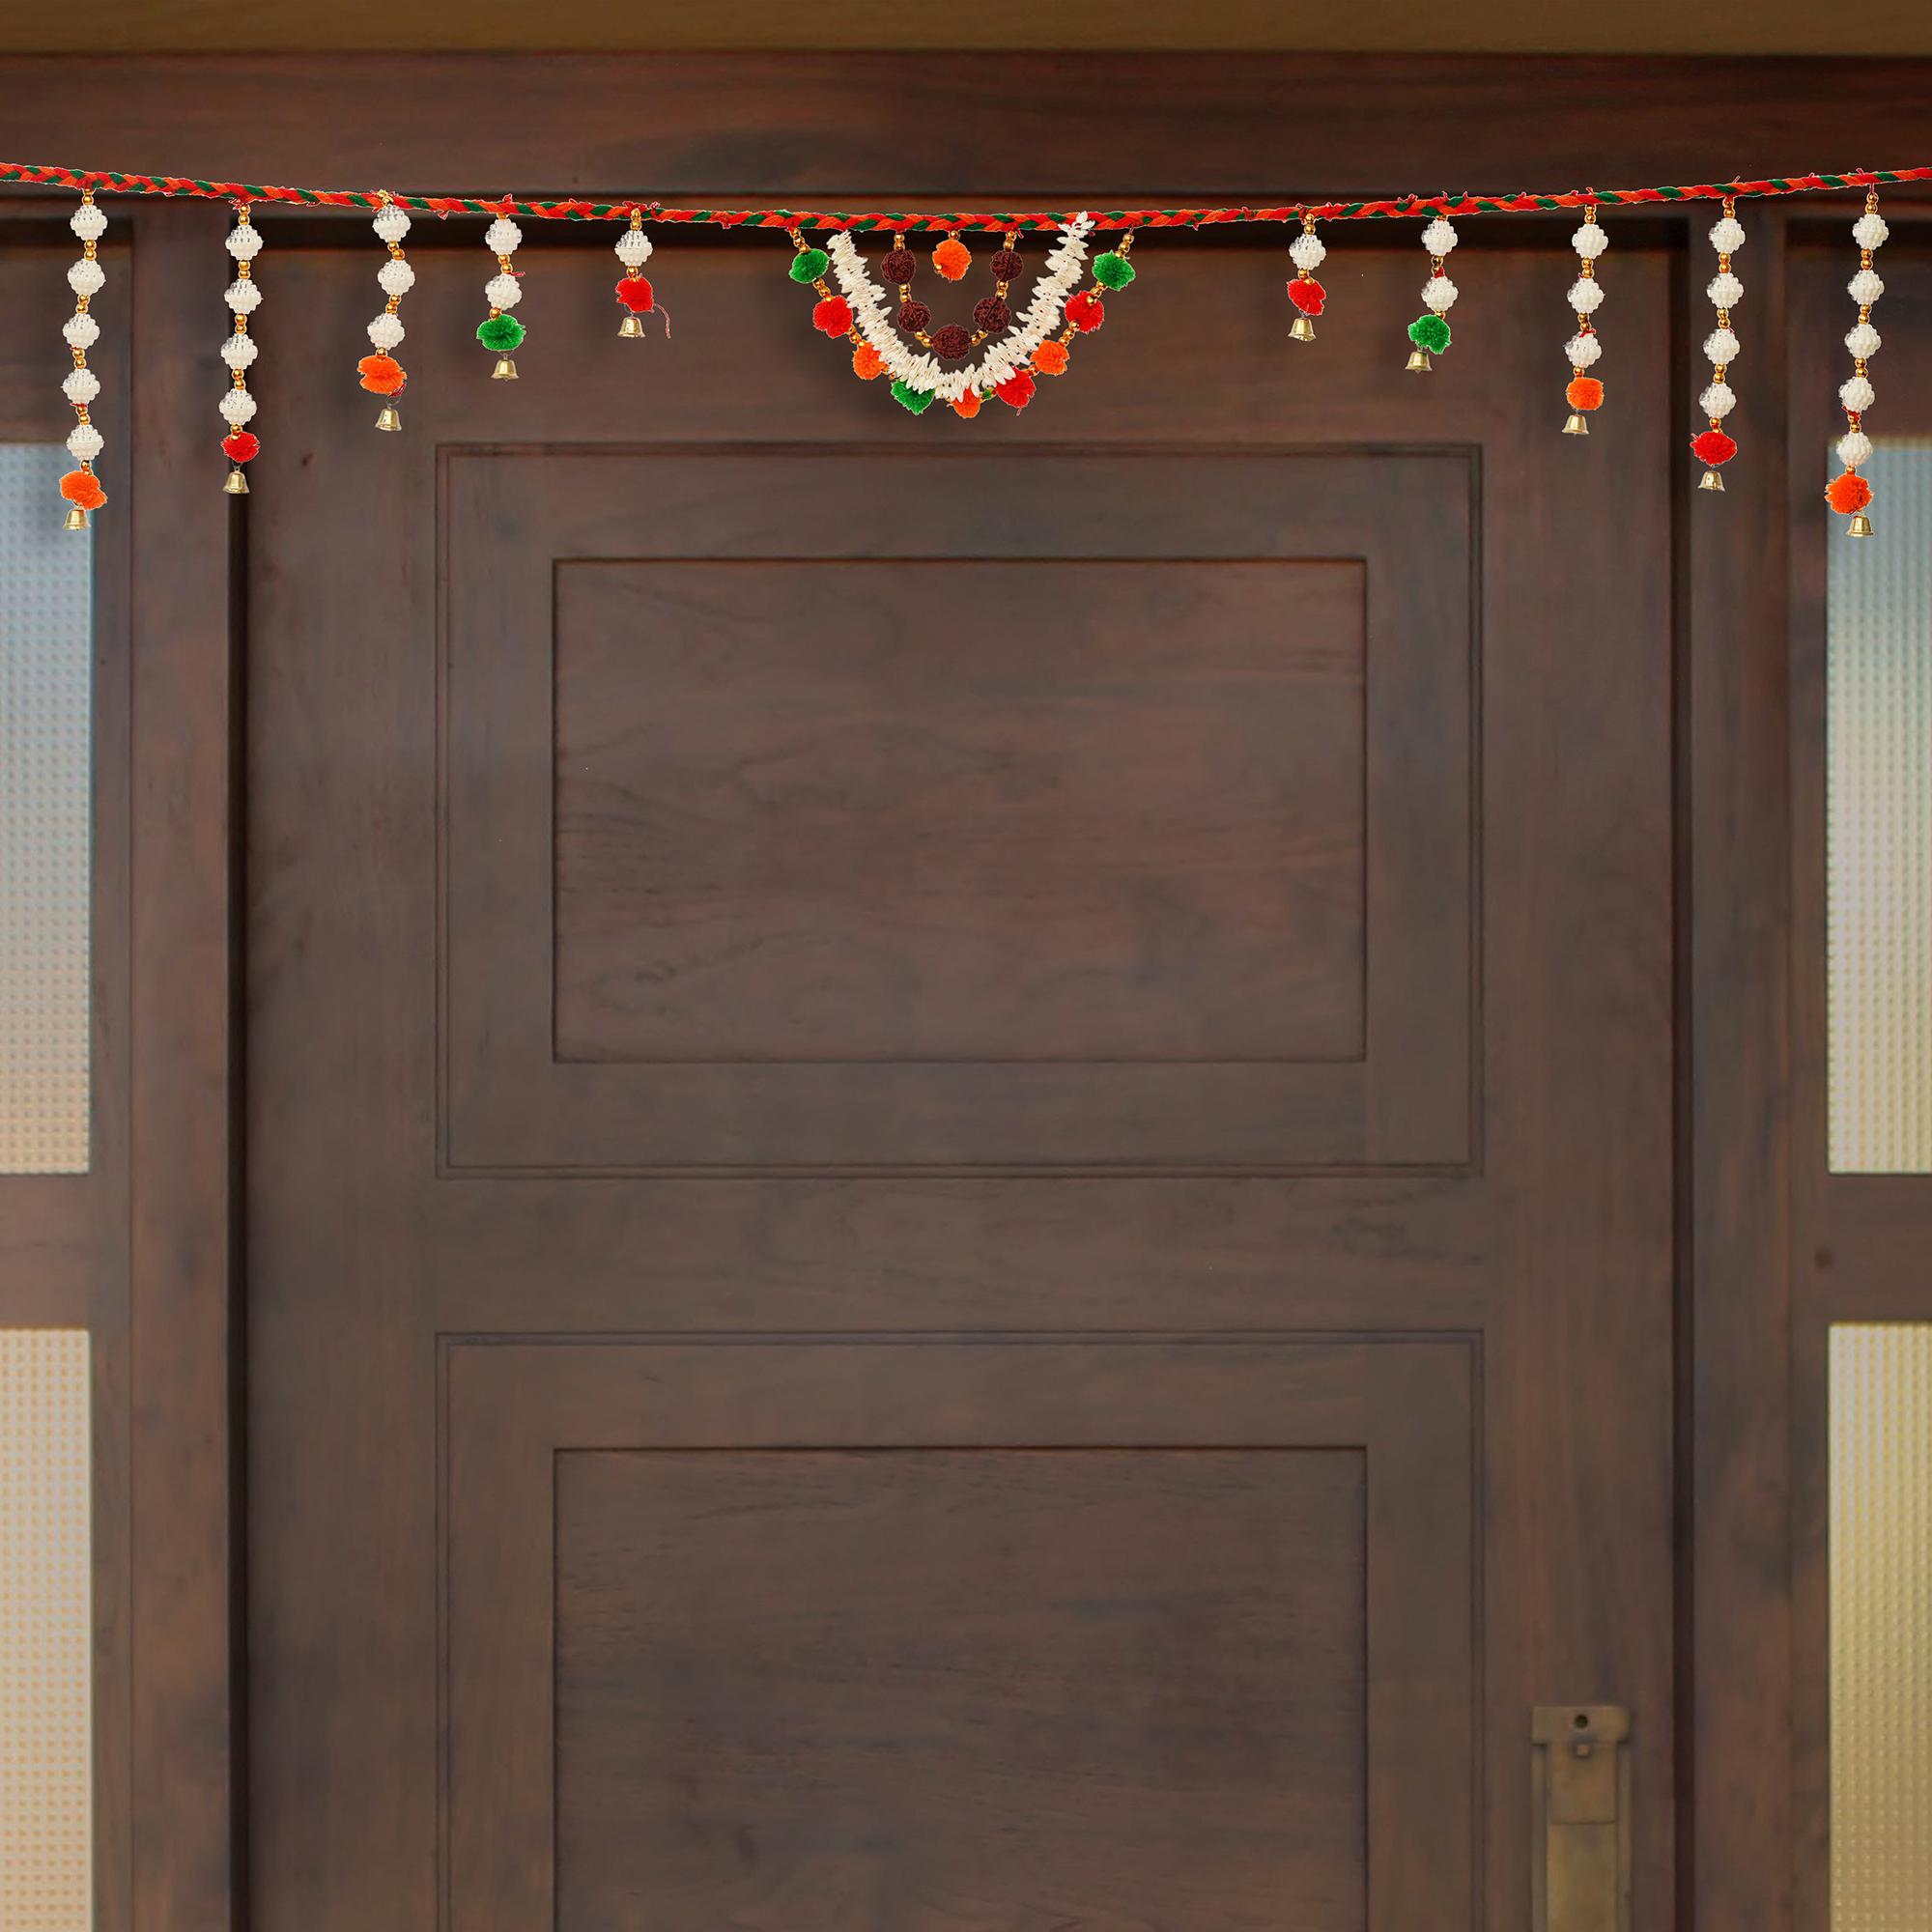 Decorative Colorful Bandarwal/Toran  Door Hanging with Shells and Rudraksh Indian Home Decor